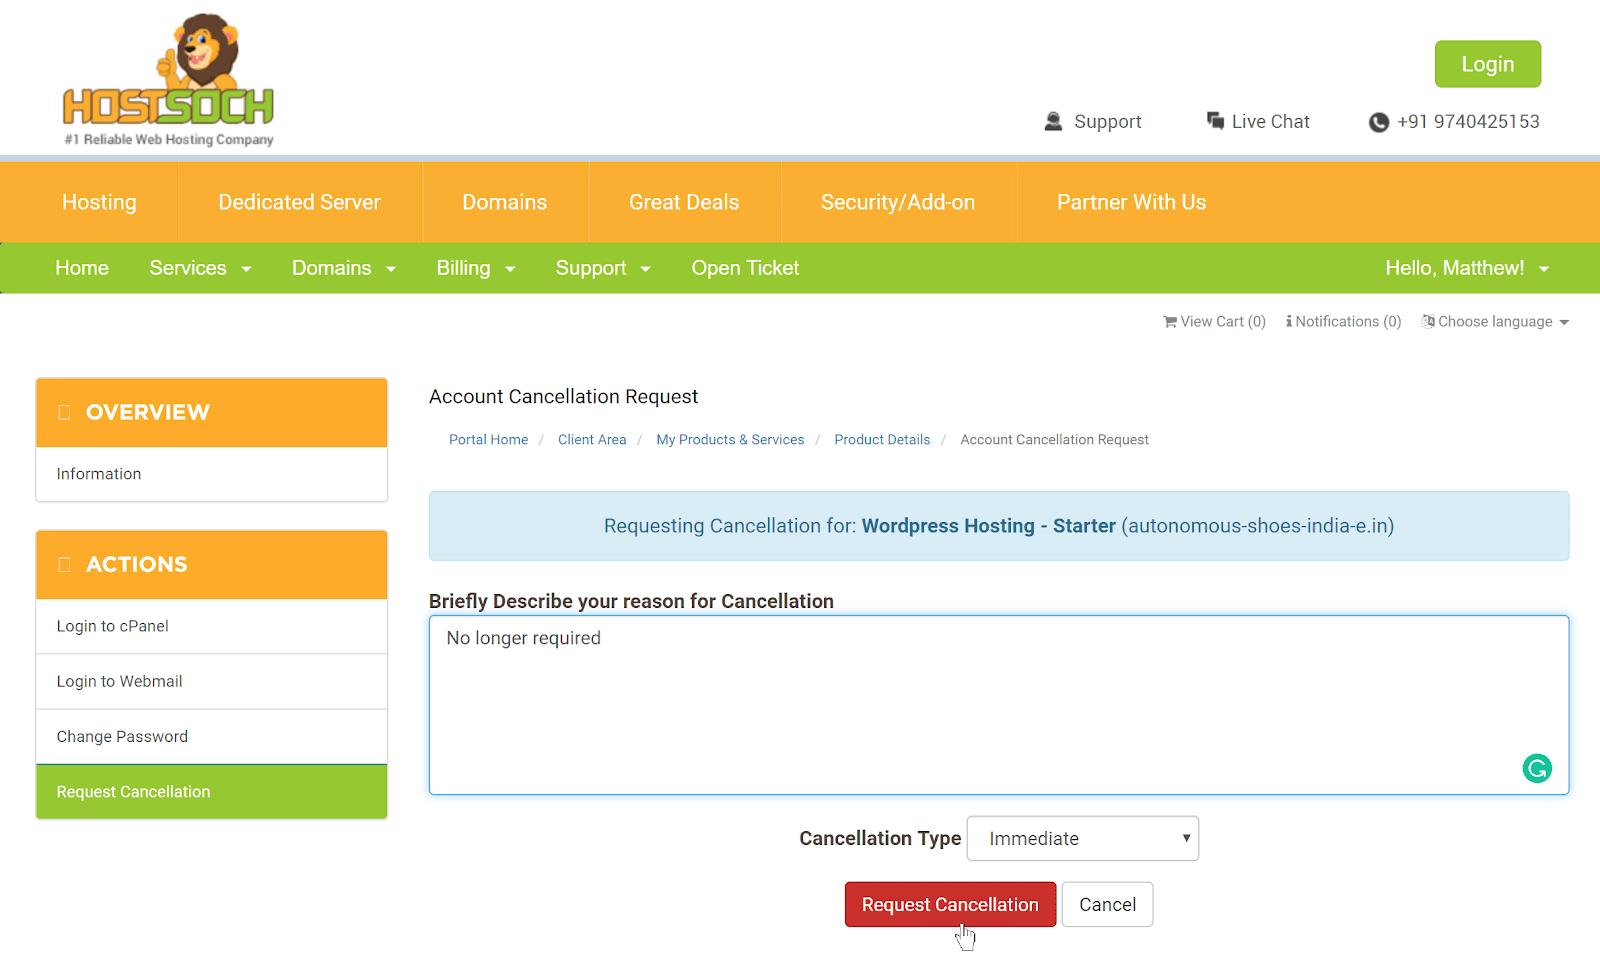 HostSoch hosting cancellation form